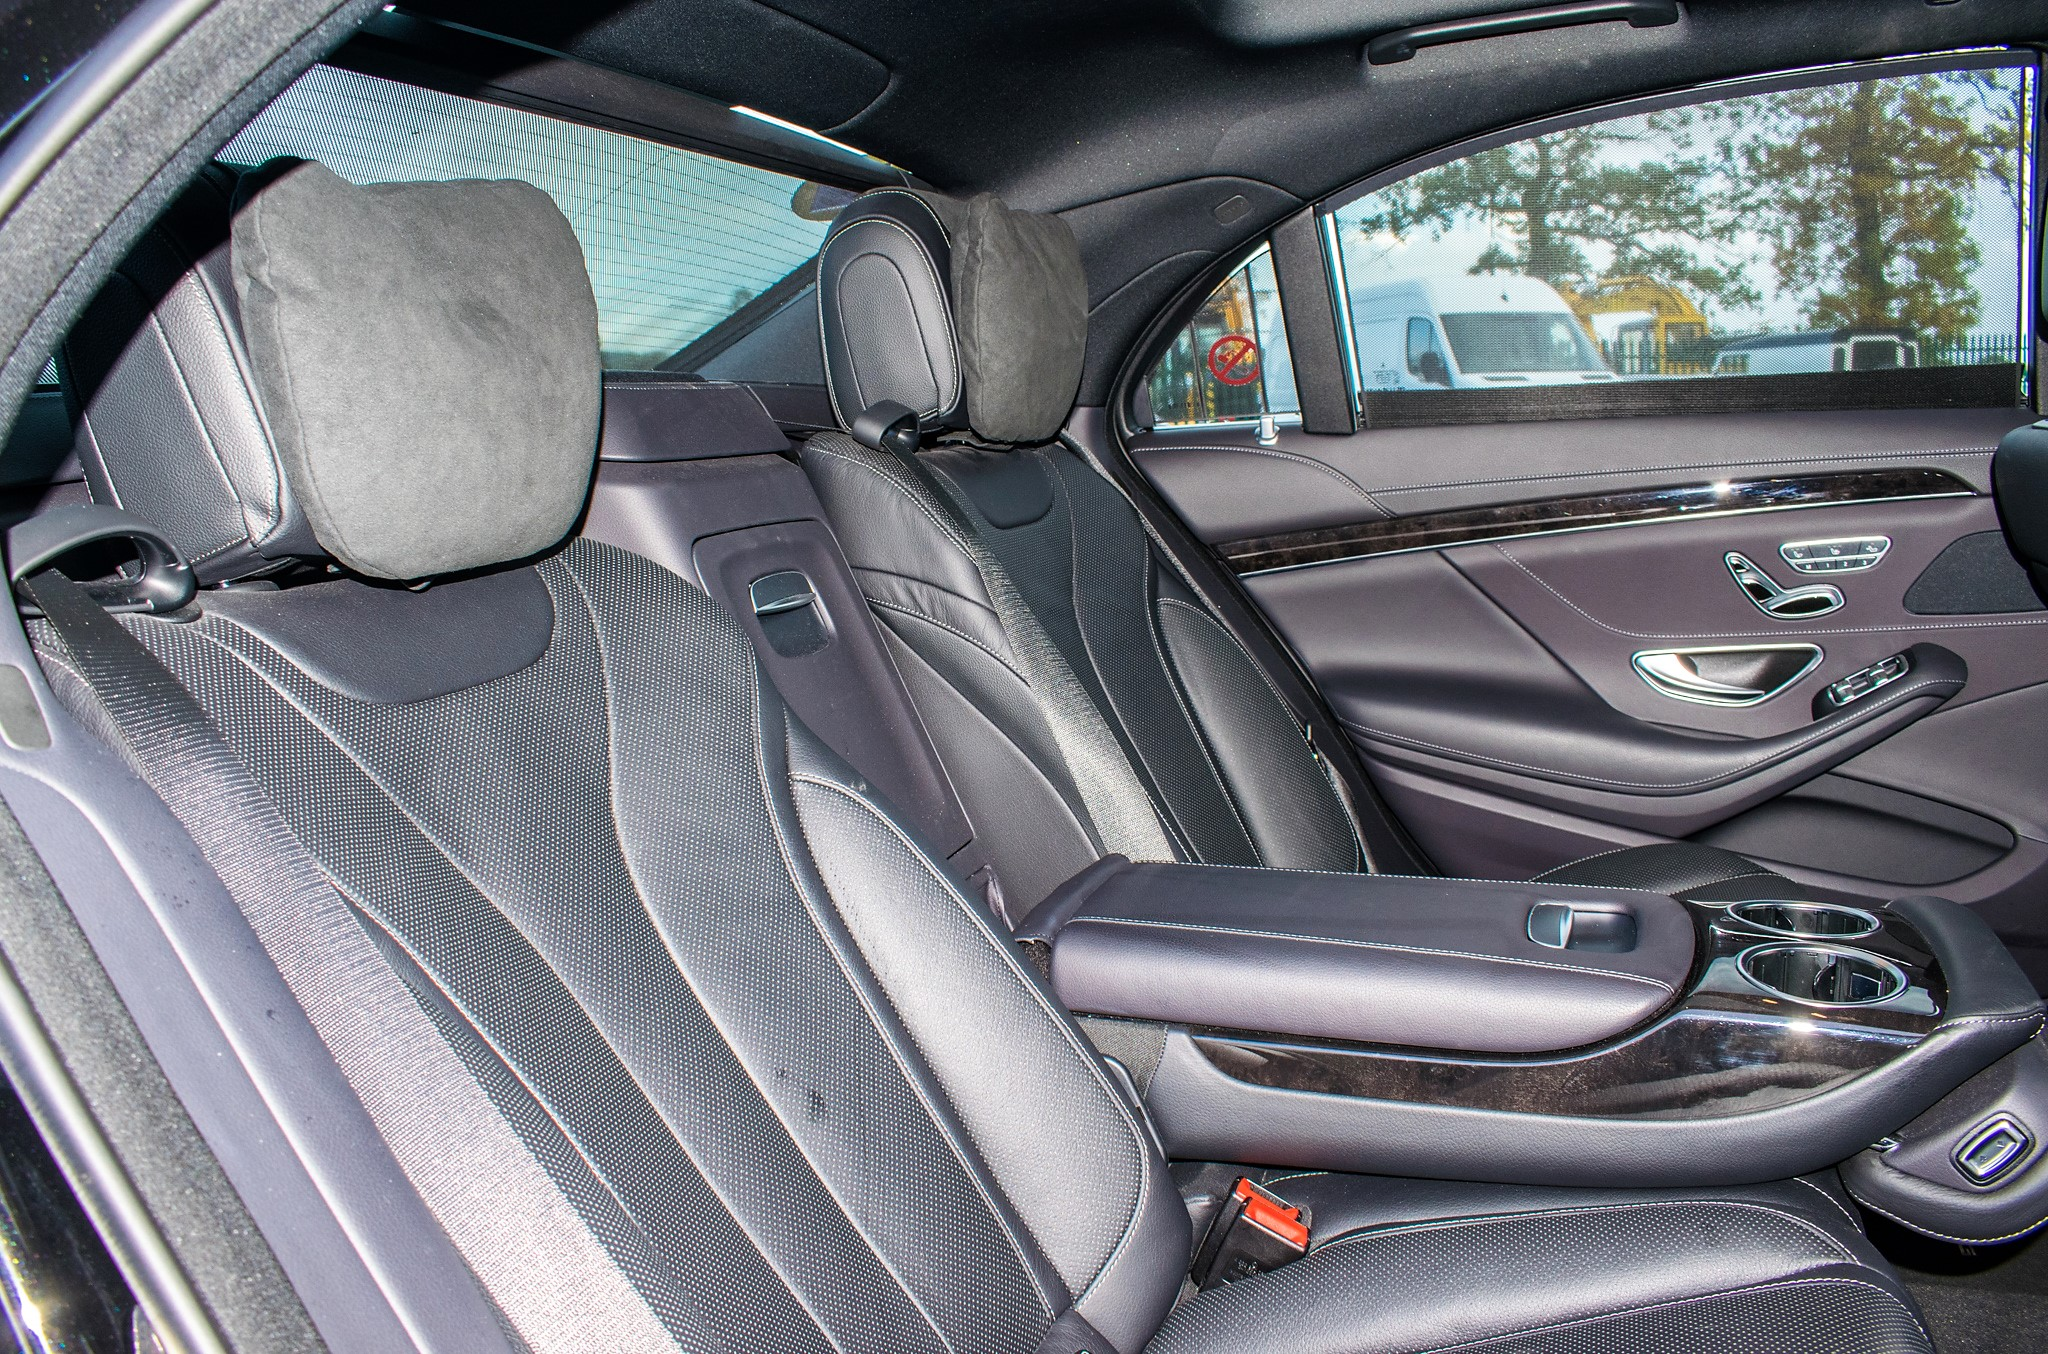 Mercedes Benz S450 L AMG Line Executive auto petrol 4 door saloon car Registration Number: FX68 - Image 22 of 33